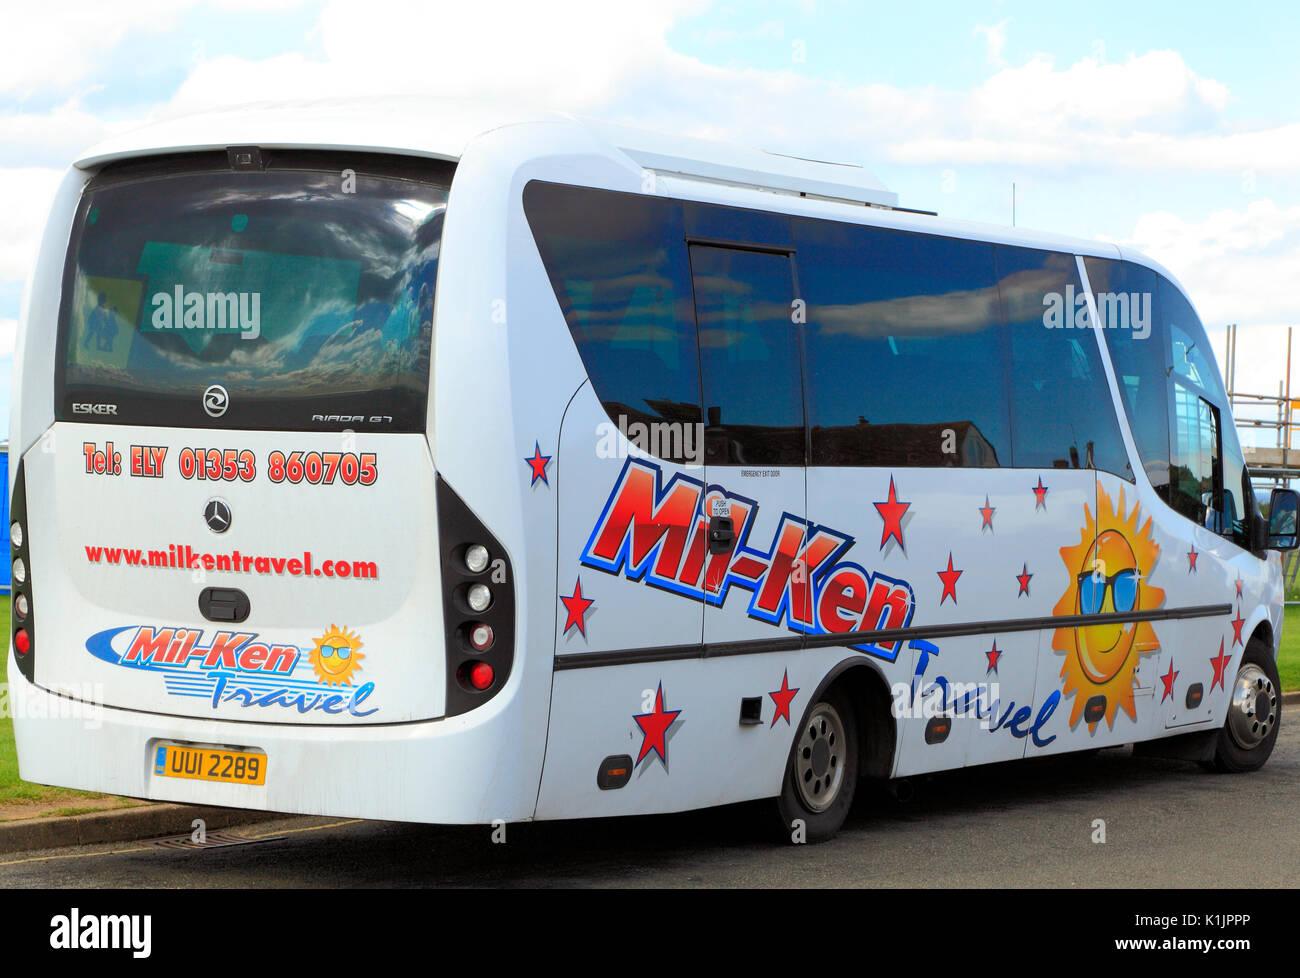 Devon Coach Tour Companies